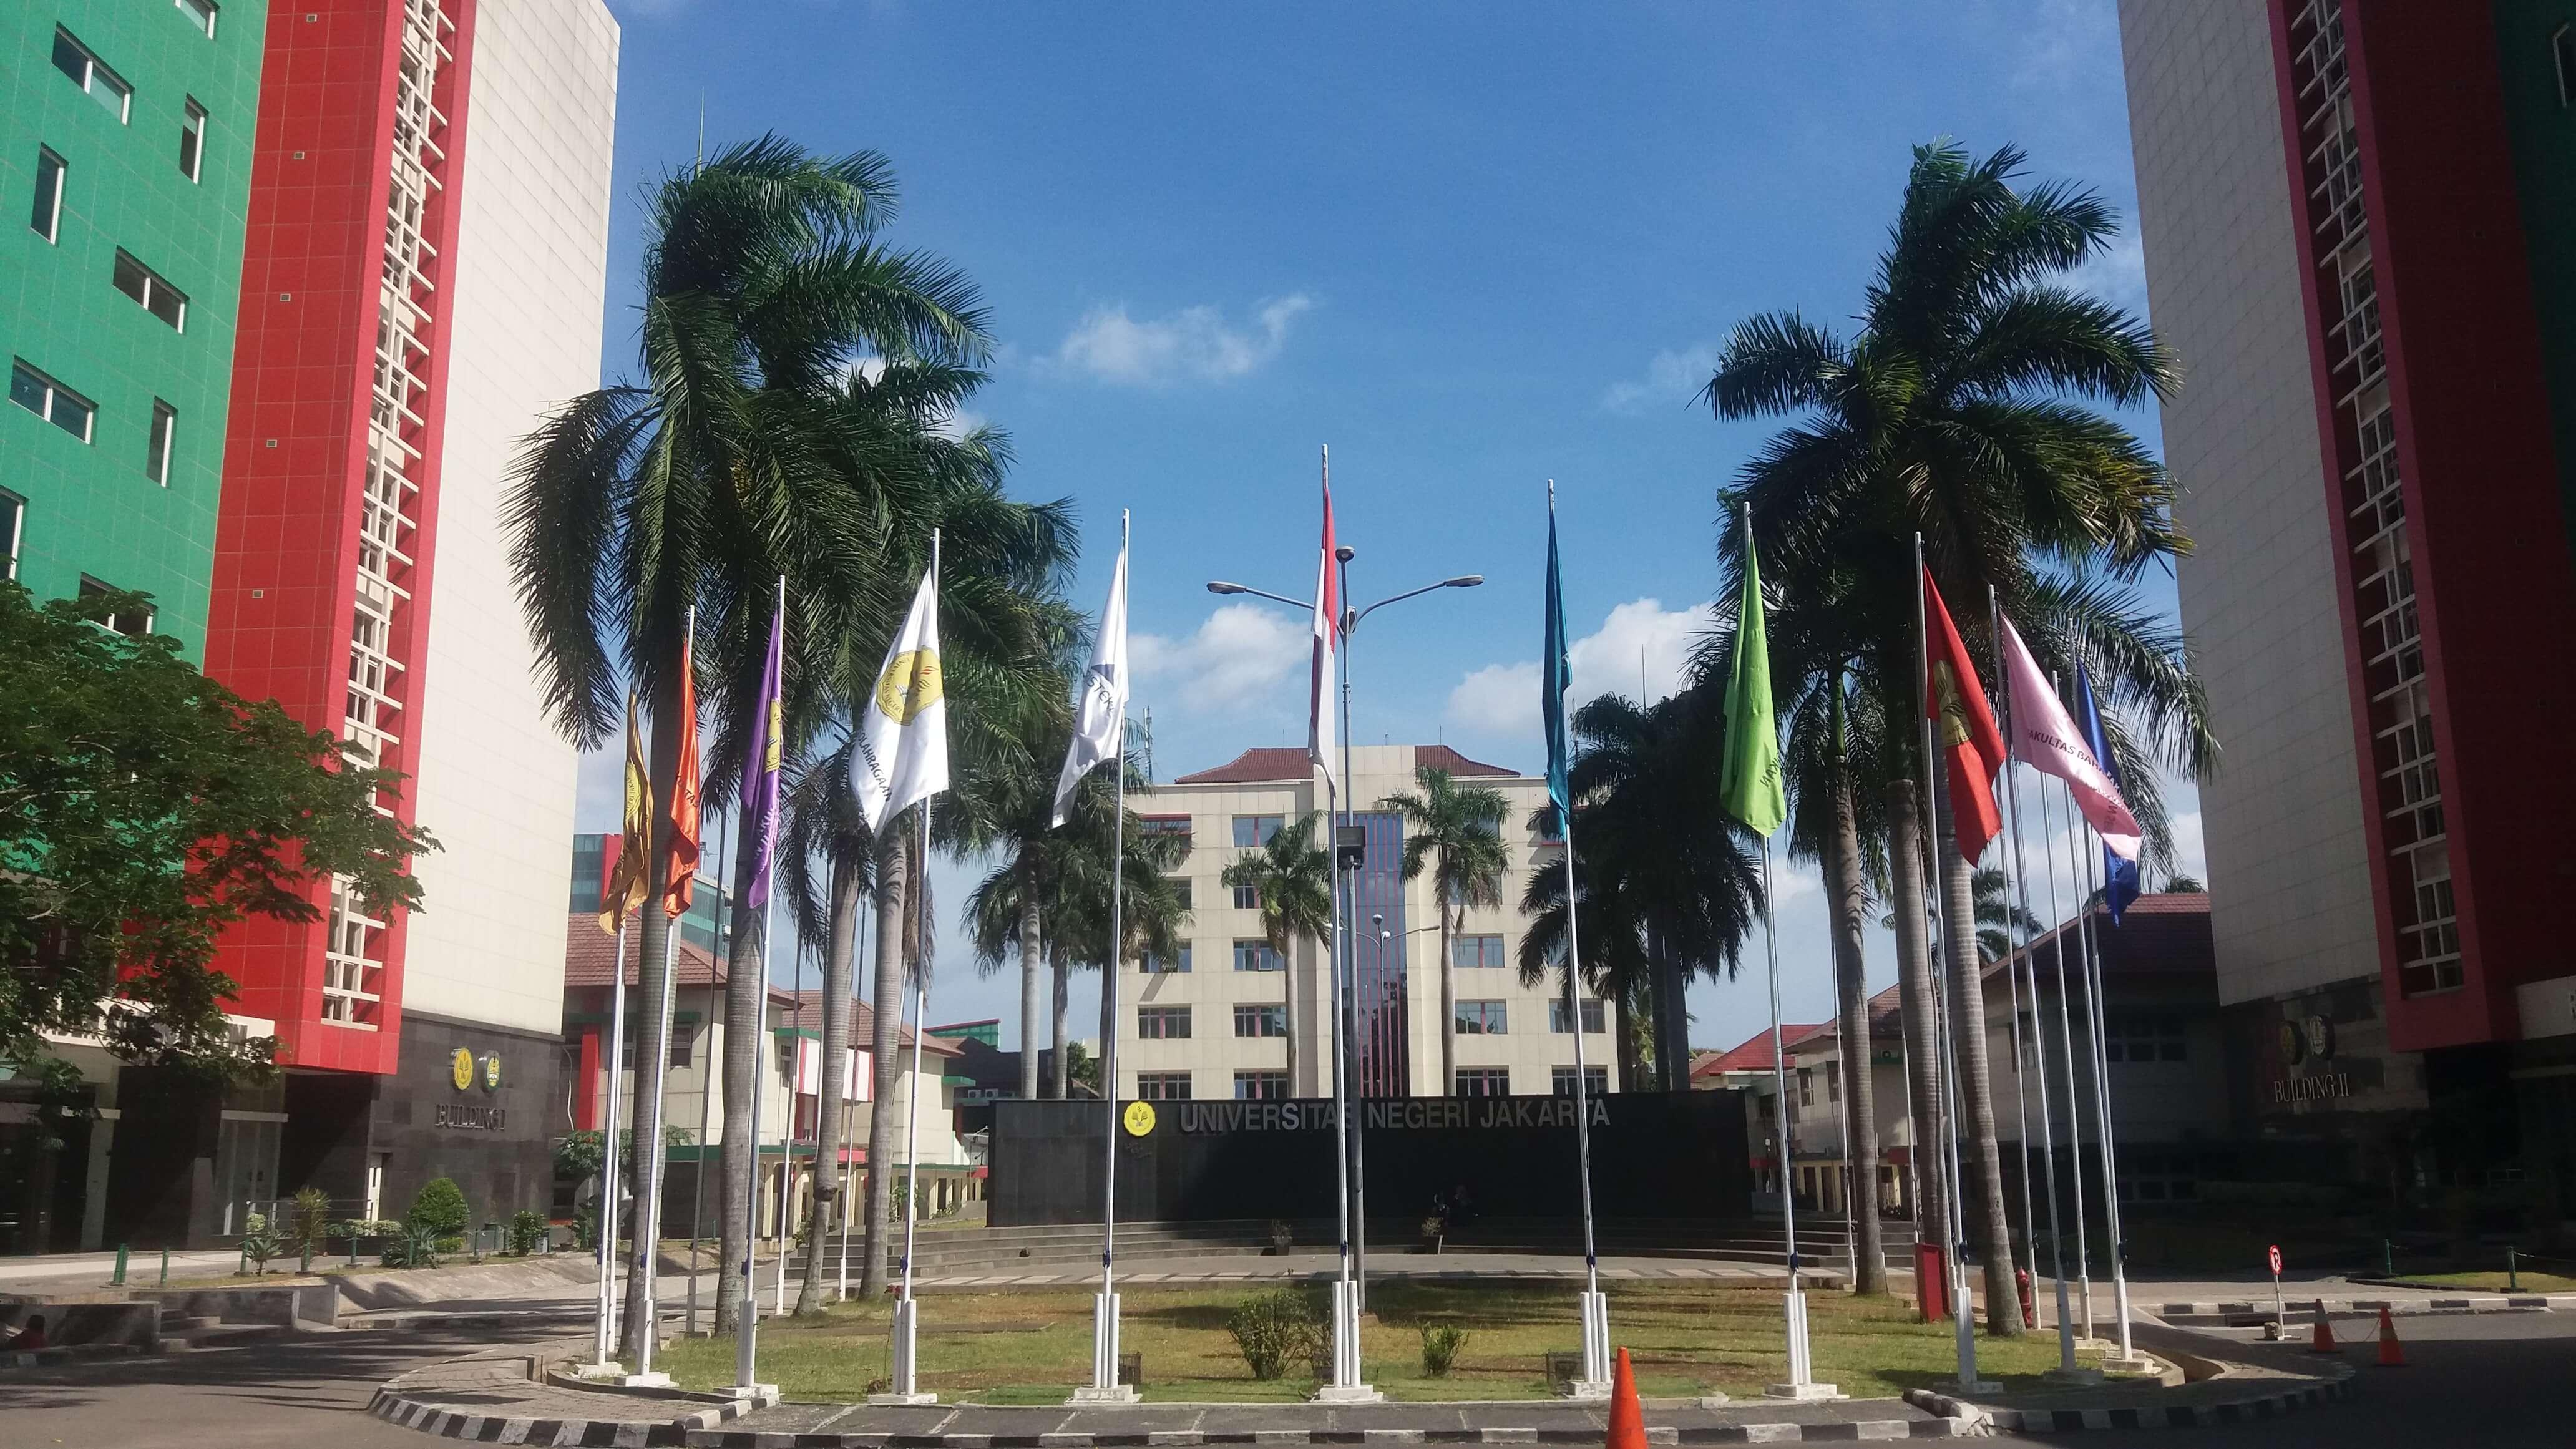 Universitas-Negeri-Jakarta-1-1